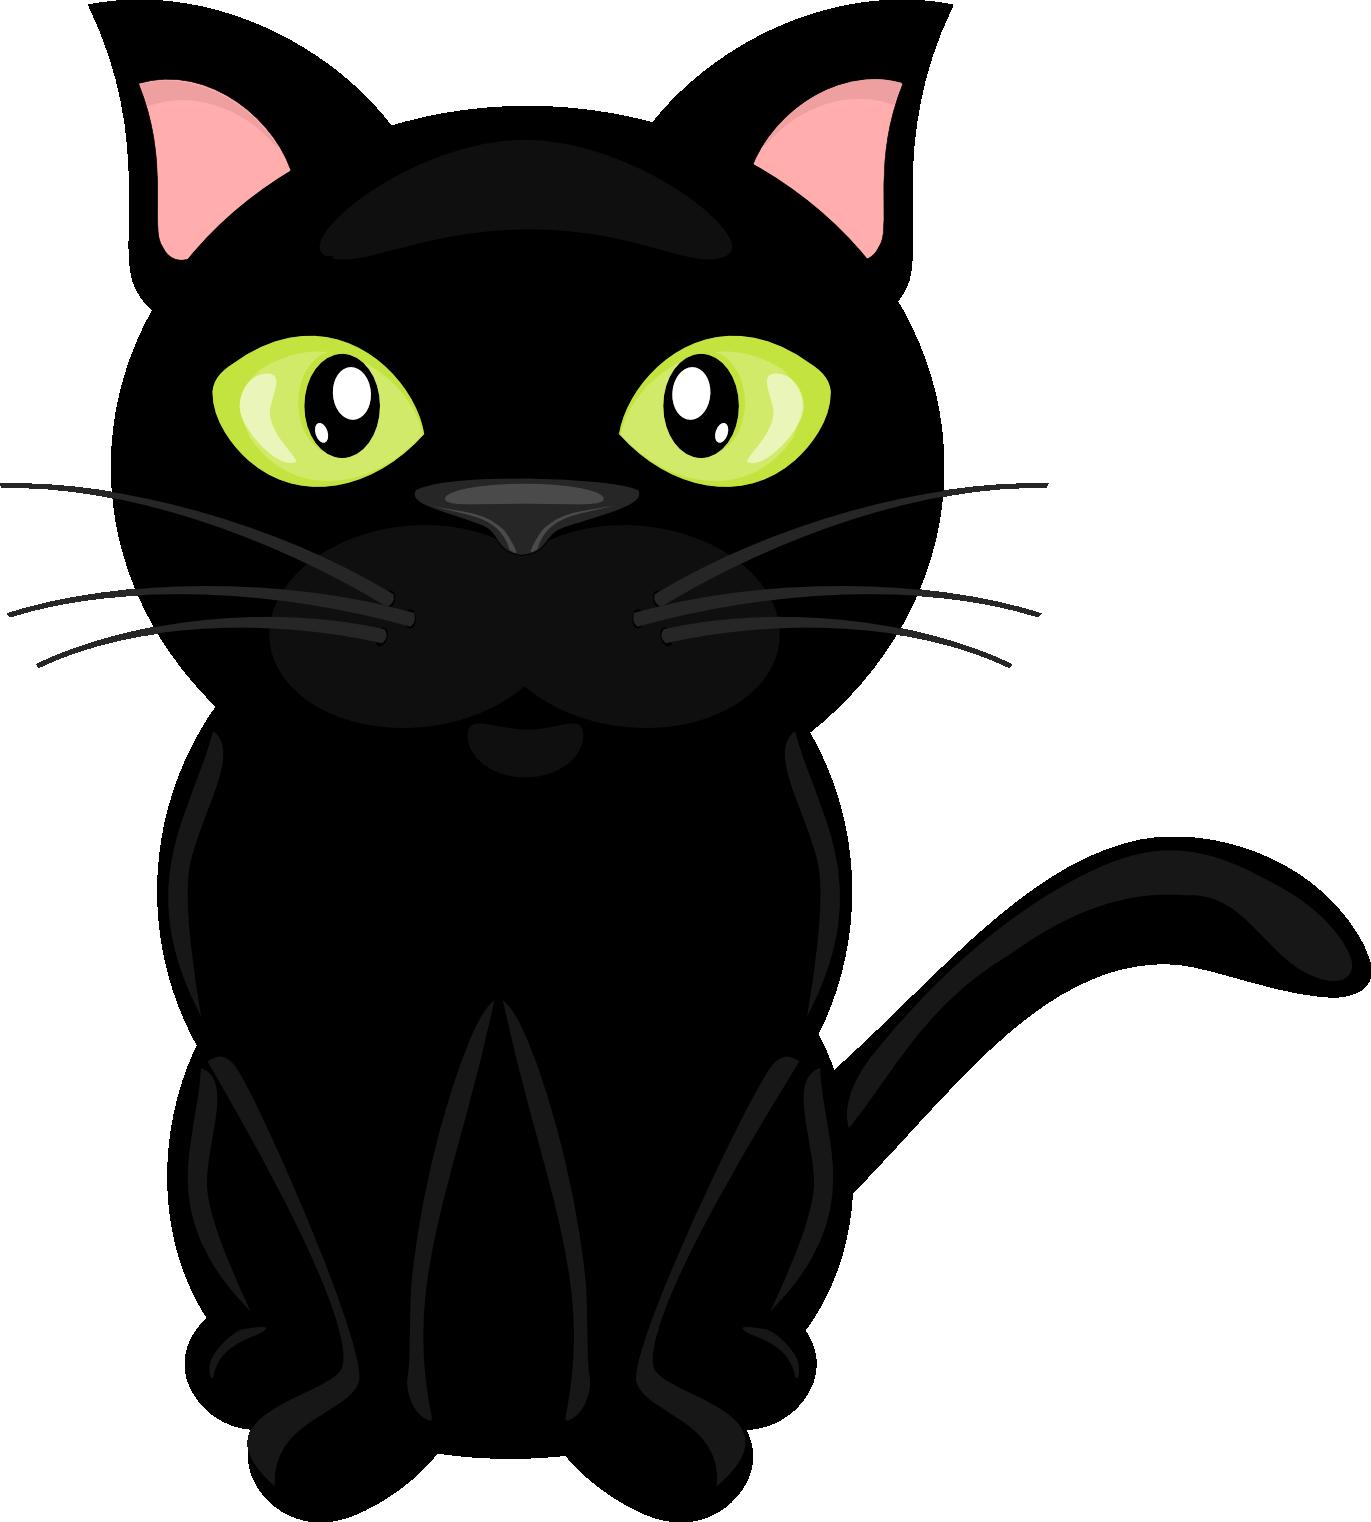 1371x1522 Tabby Cat Clipart Free Kitten